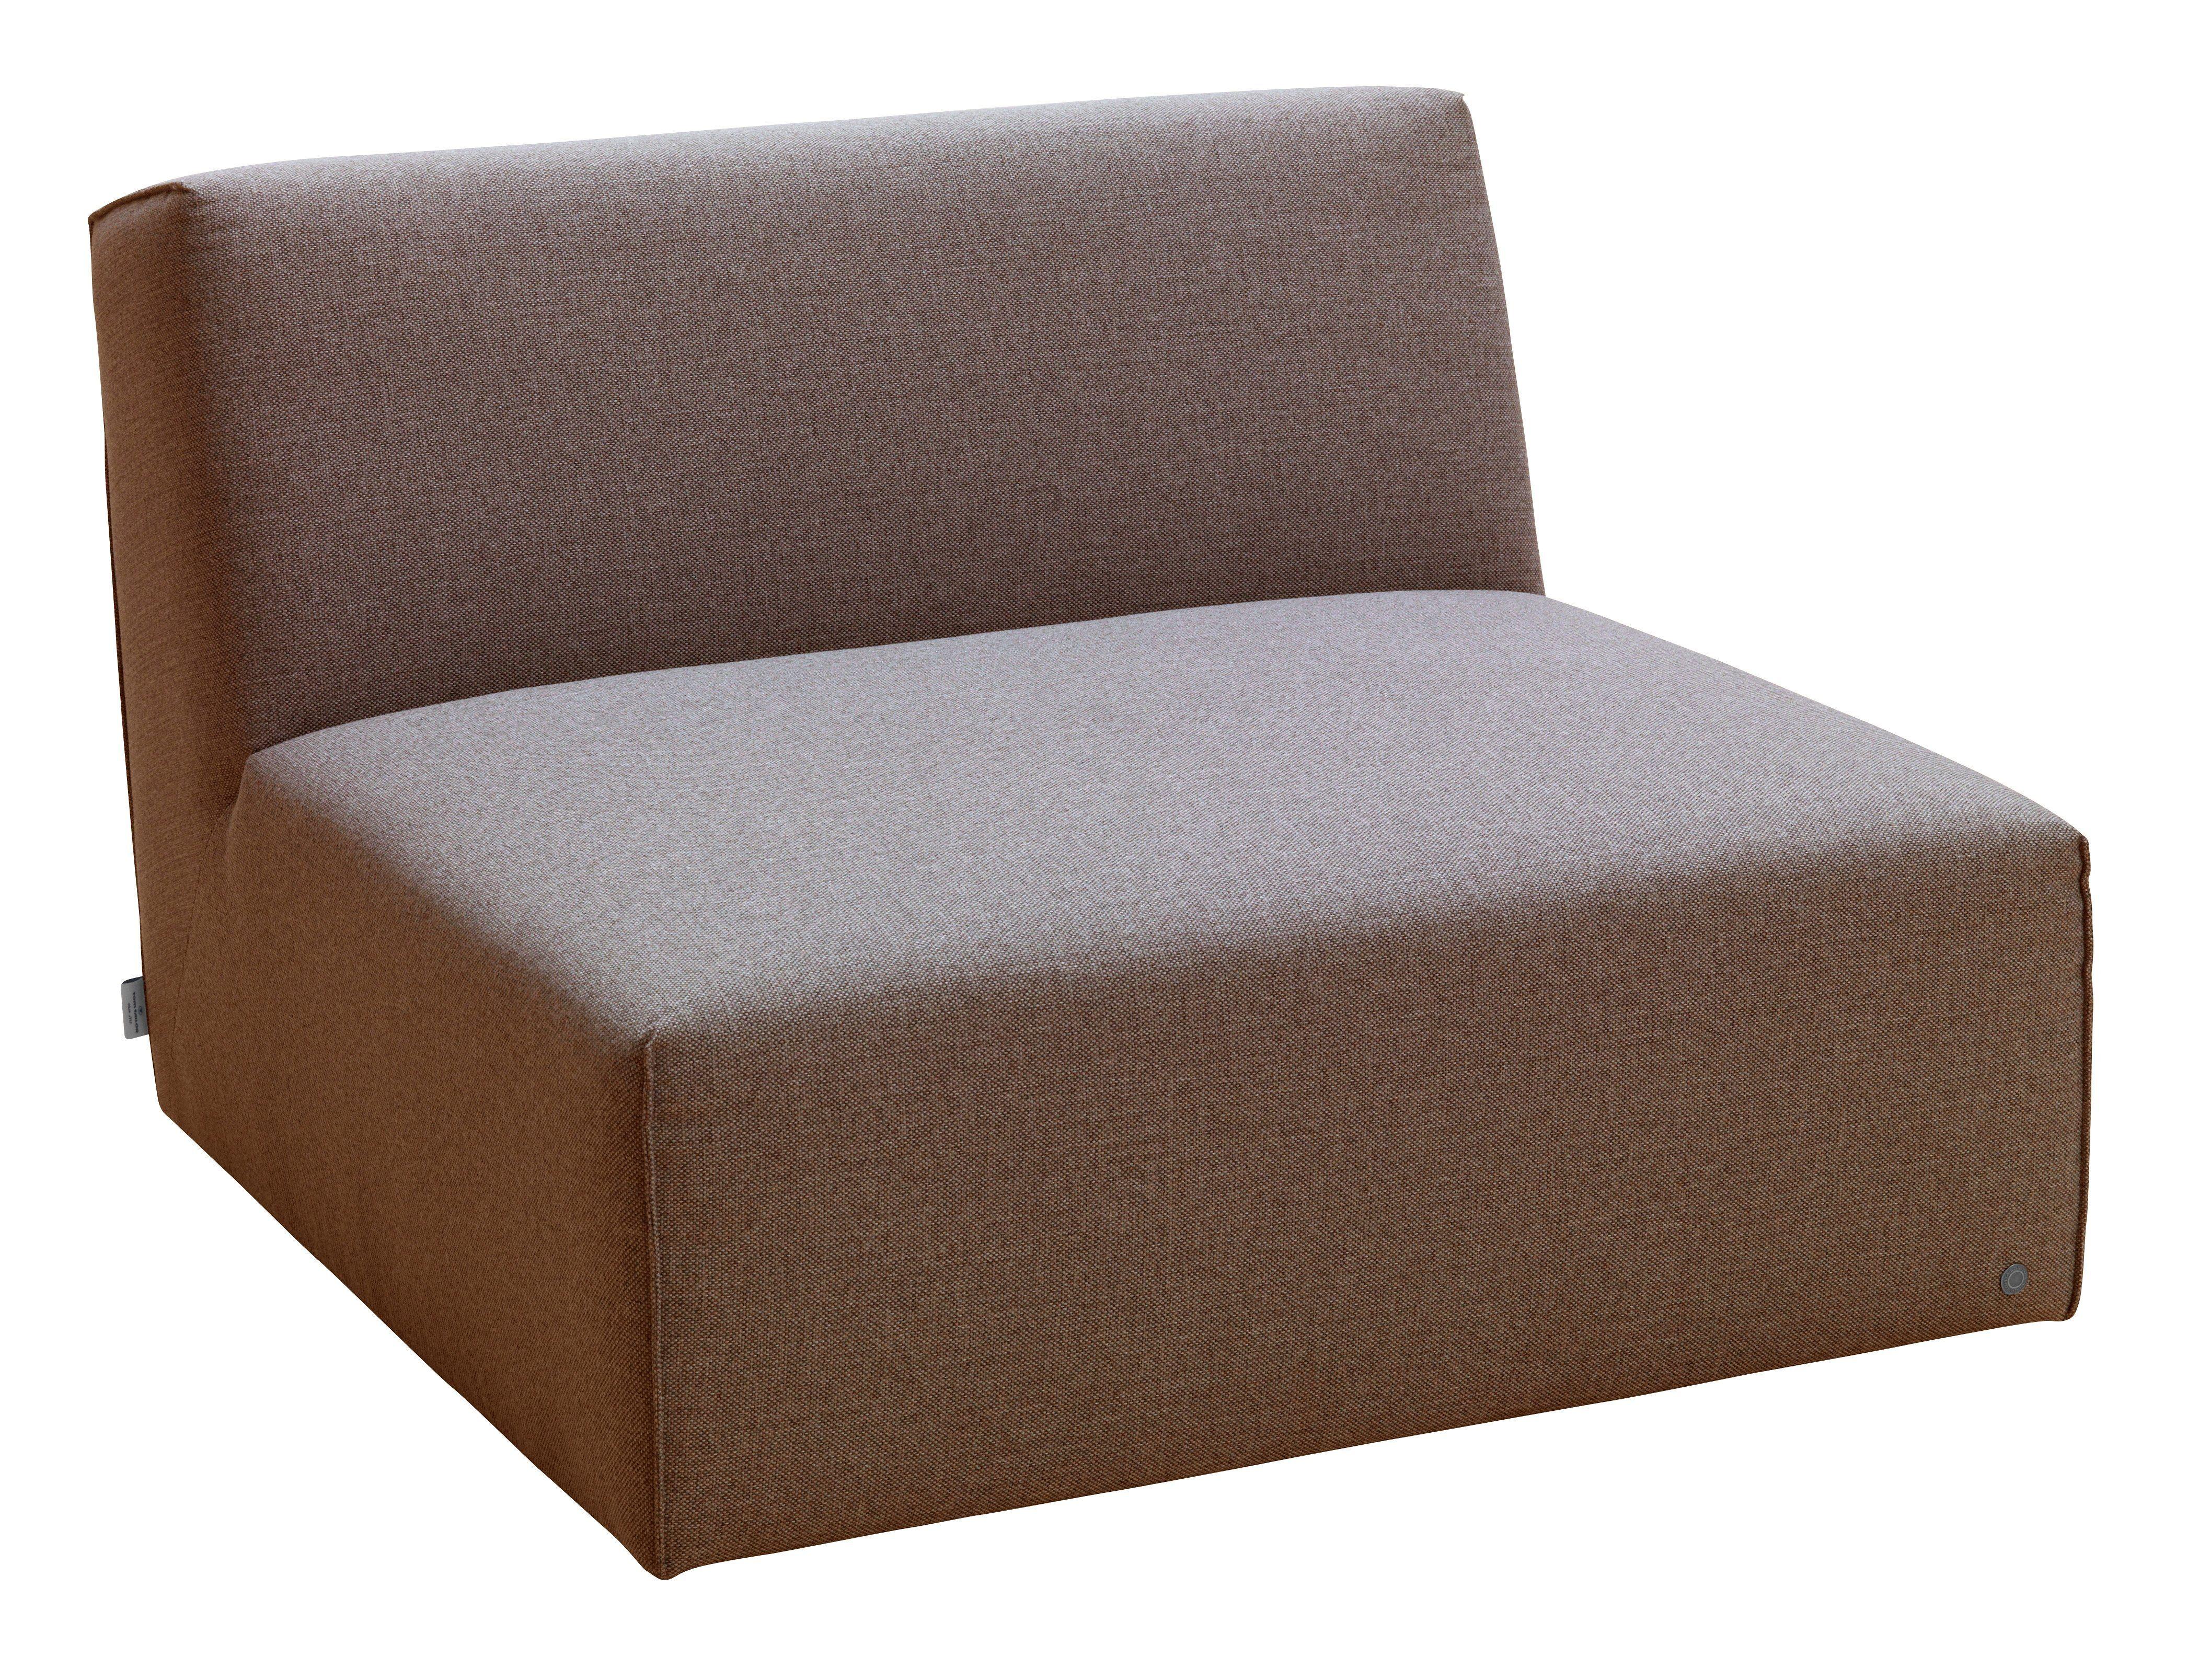 TOM TAILOR Sofaelement »ELEMENTS«, Sitzelement ohne Armlehne, coconut brown TBO 12